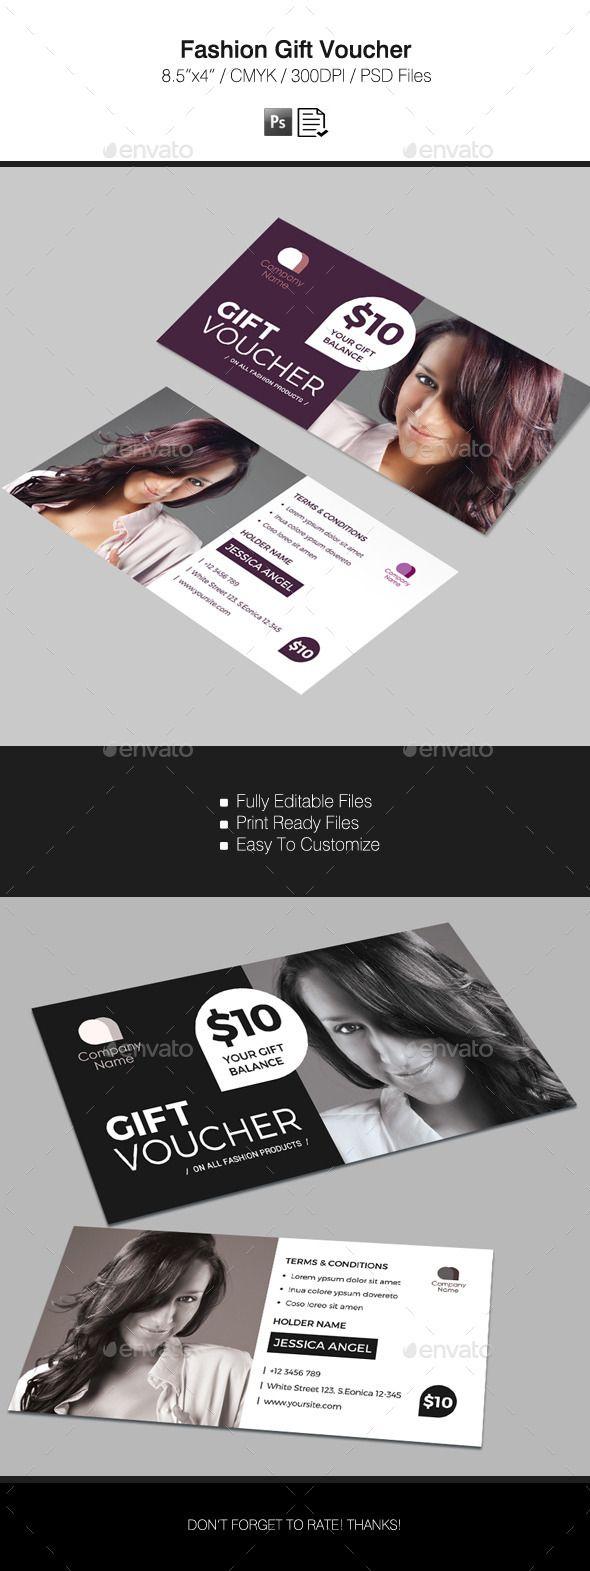 Fashion Voucher Template PSD Design Download Graphicriver